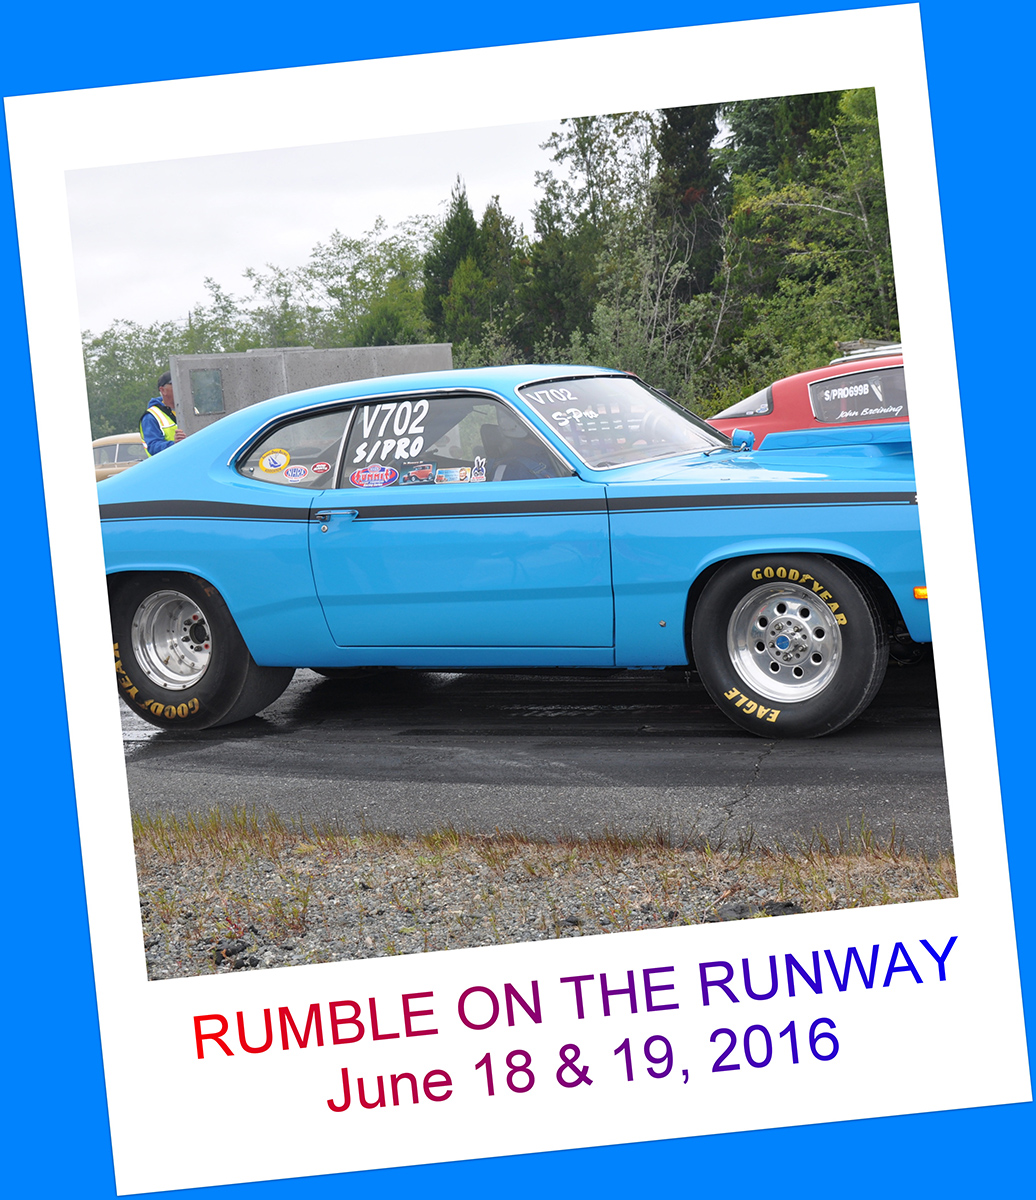 Rumble on the Runway June 18 & 19, 2016 992